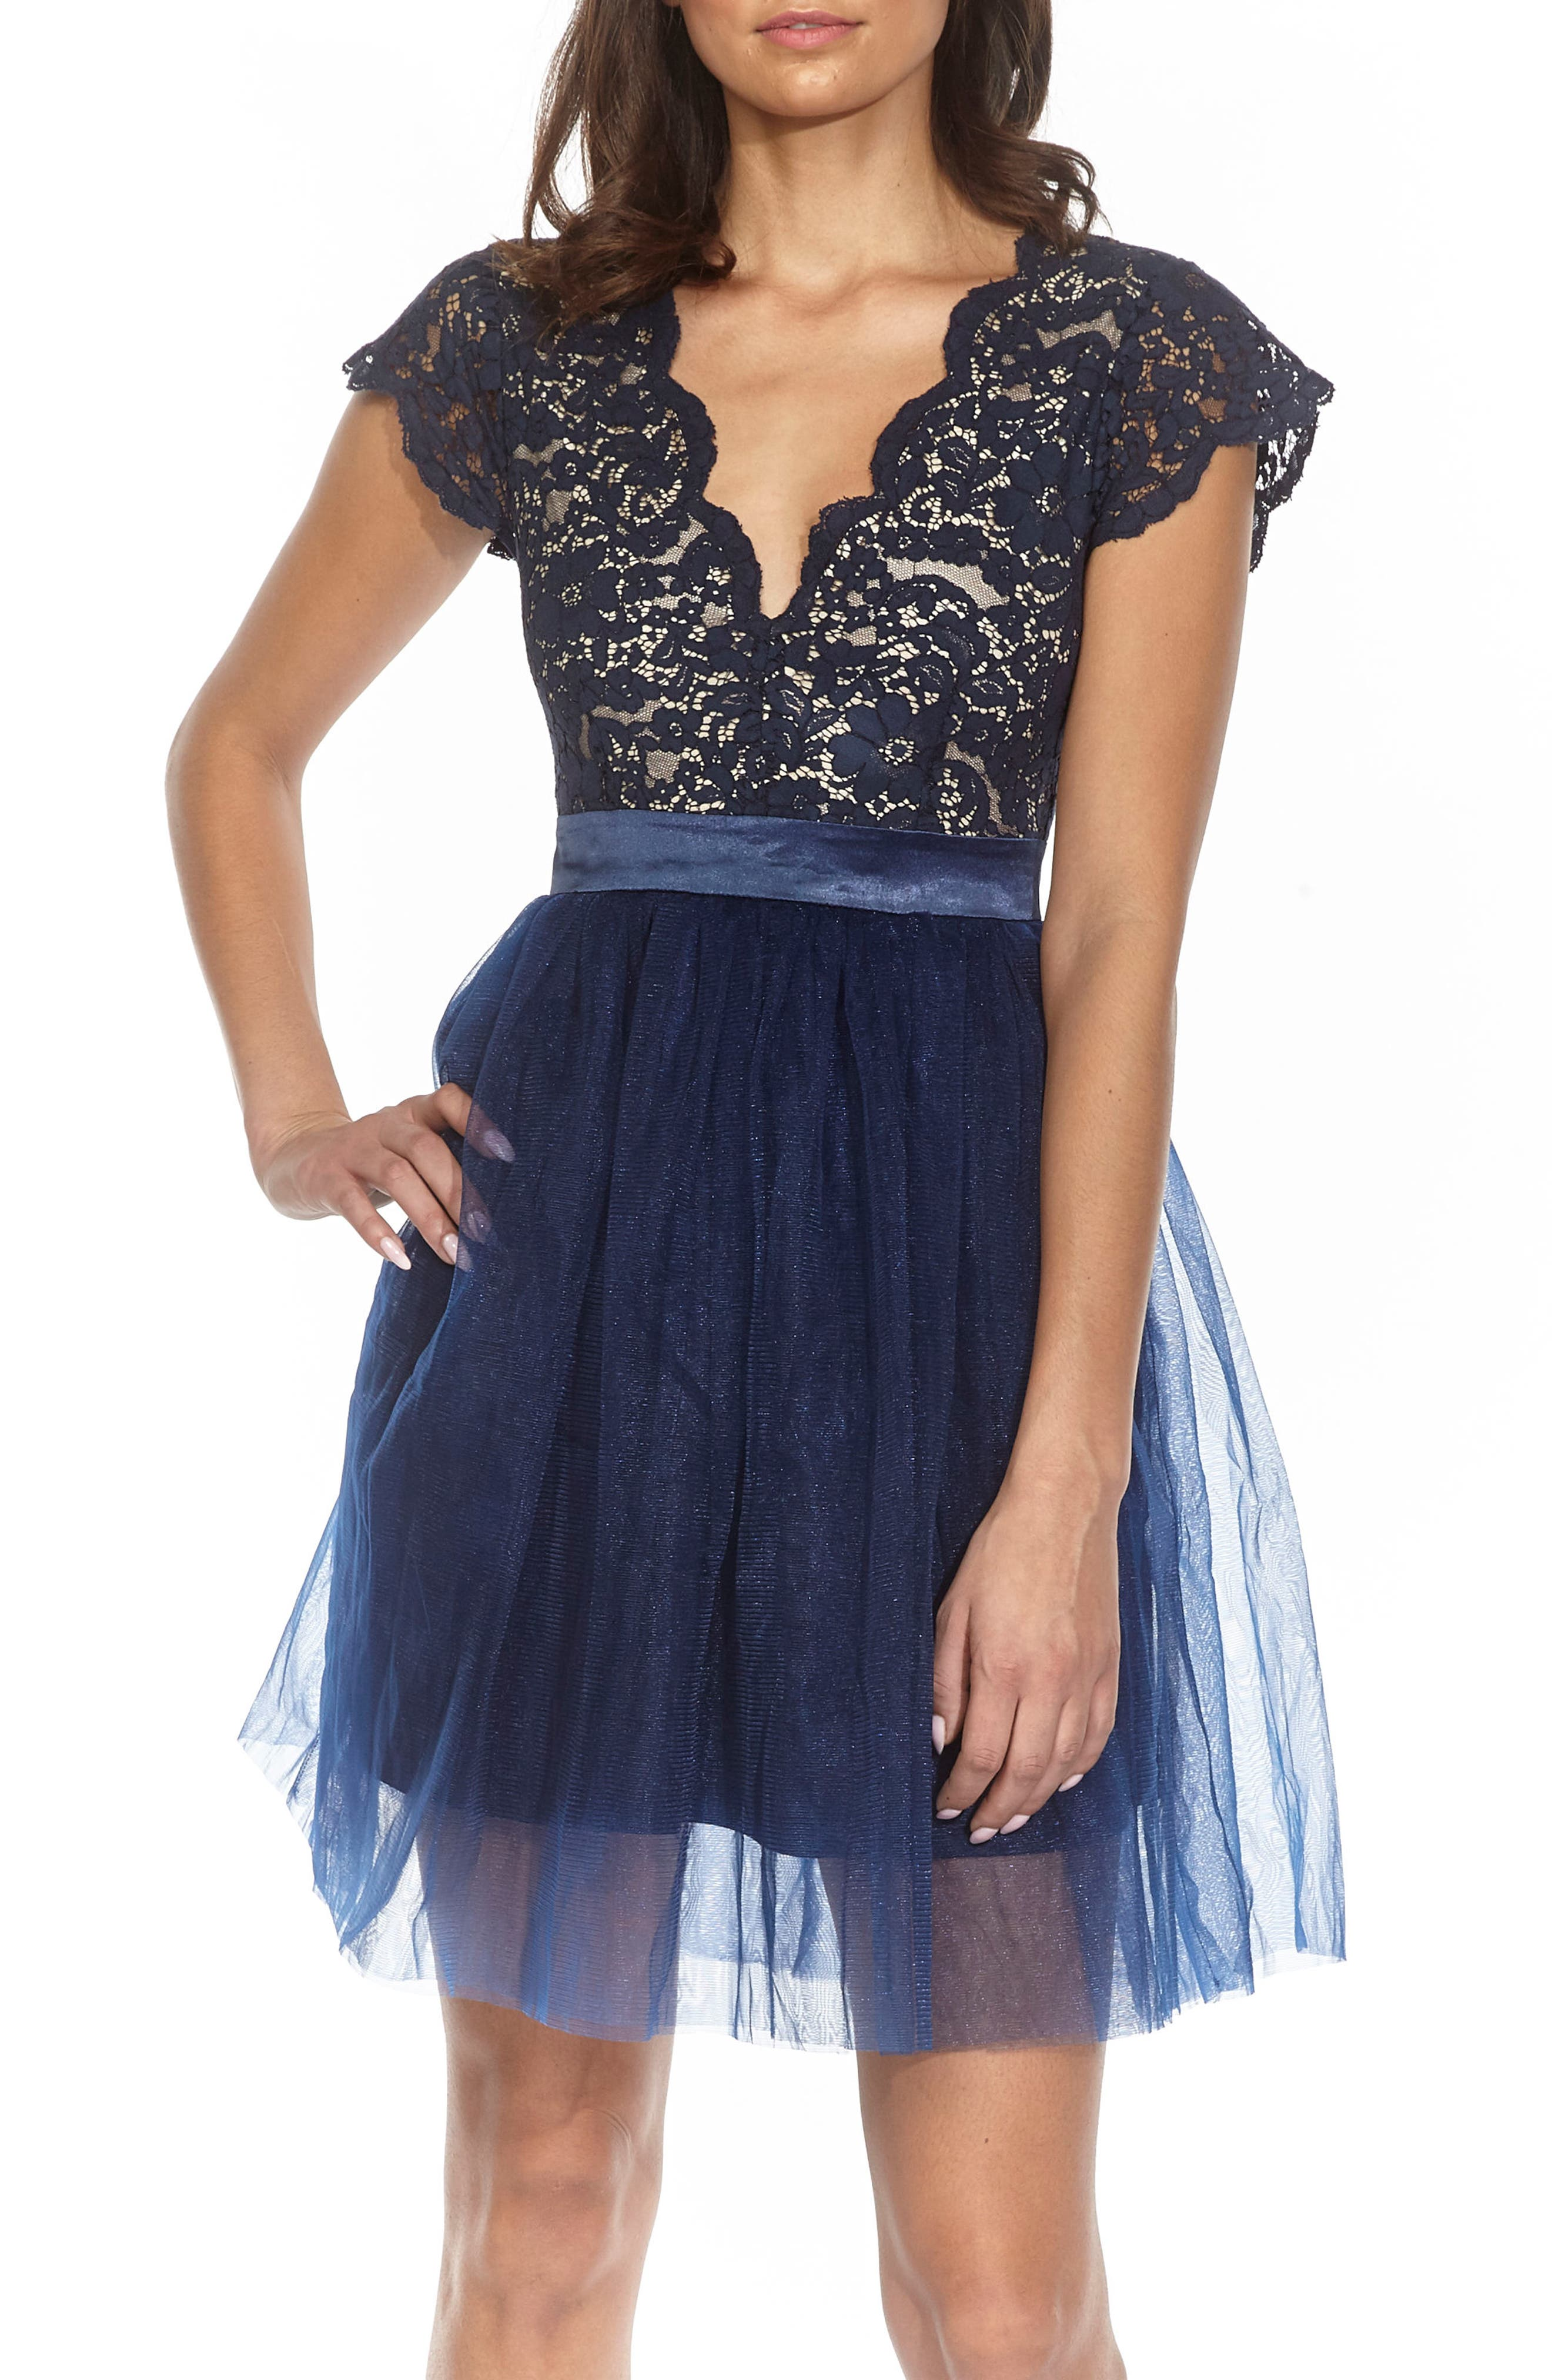 Macen Scalloped Lace Skater Dress,                         Main,                         color, Navy